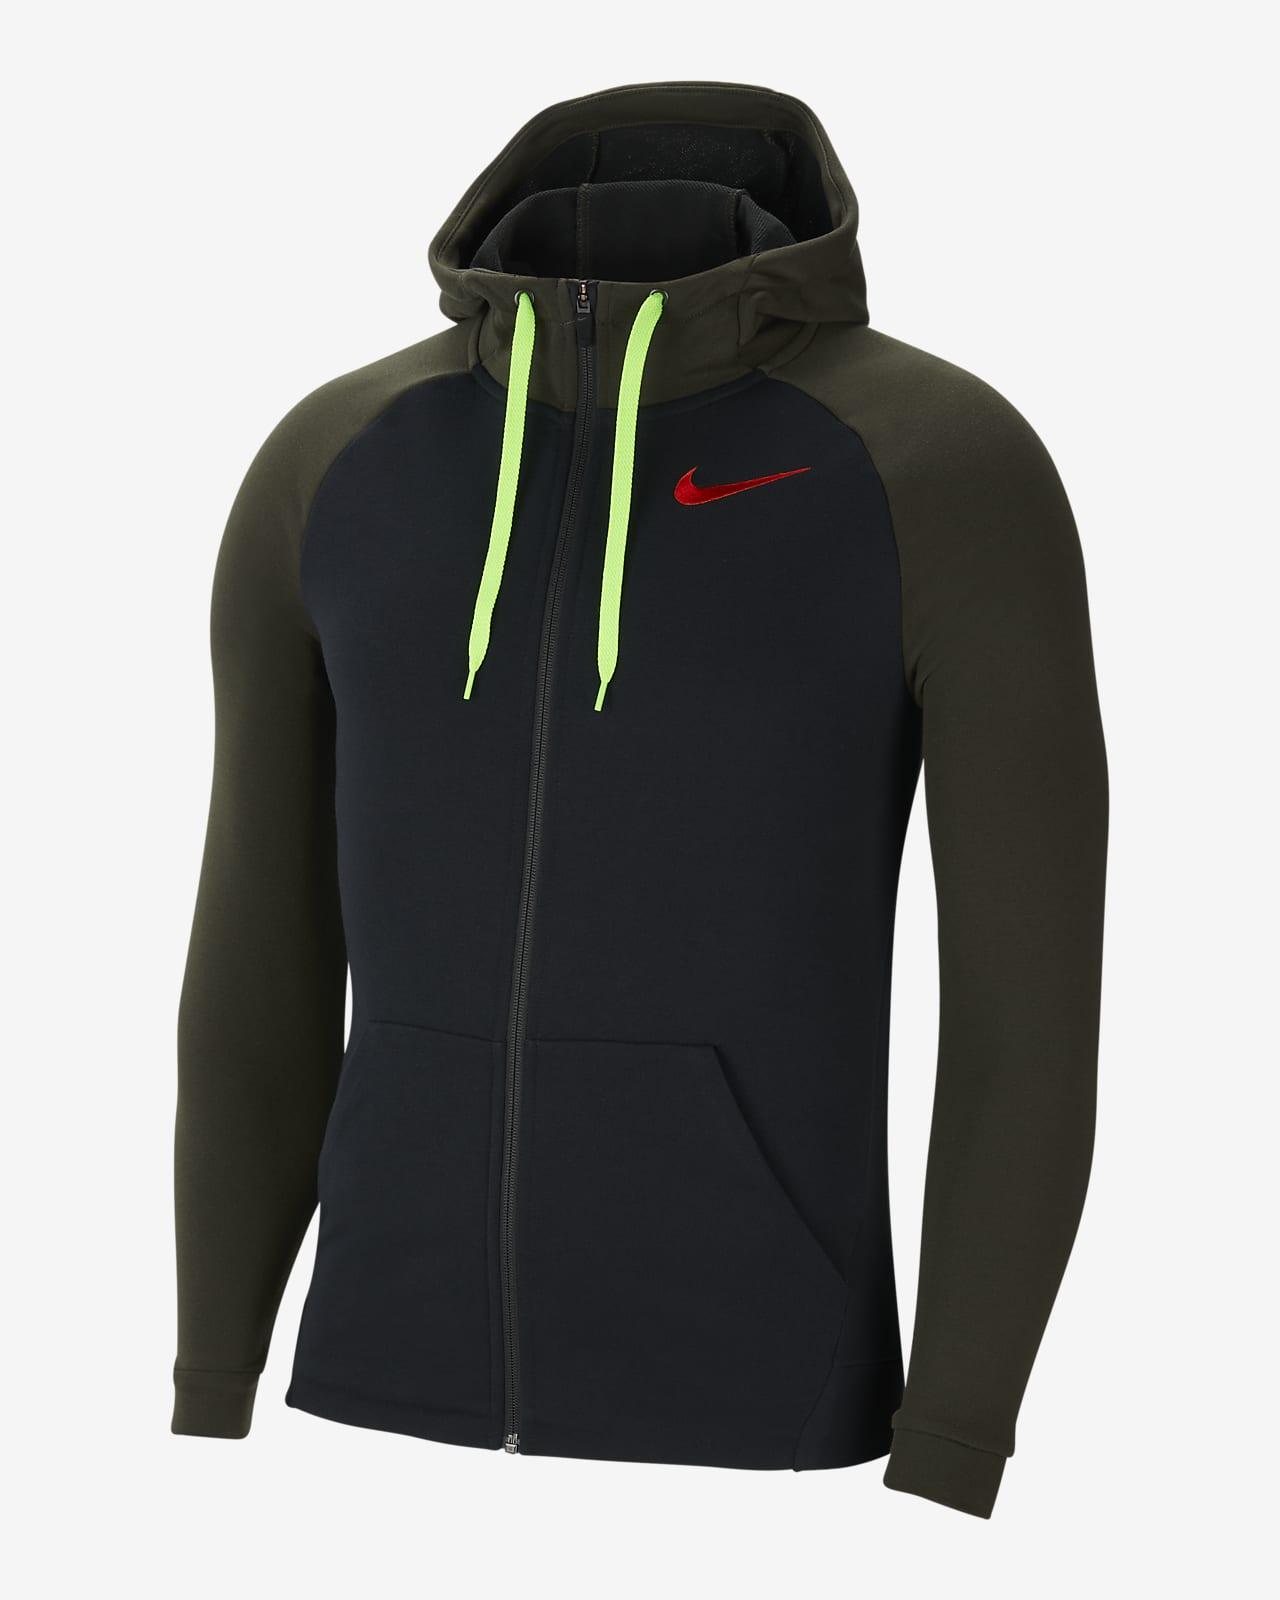 Nike Dri-FIT Men's Full-Zip Fleece Training Hoodie